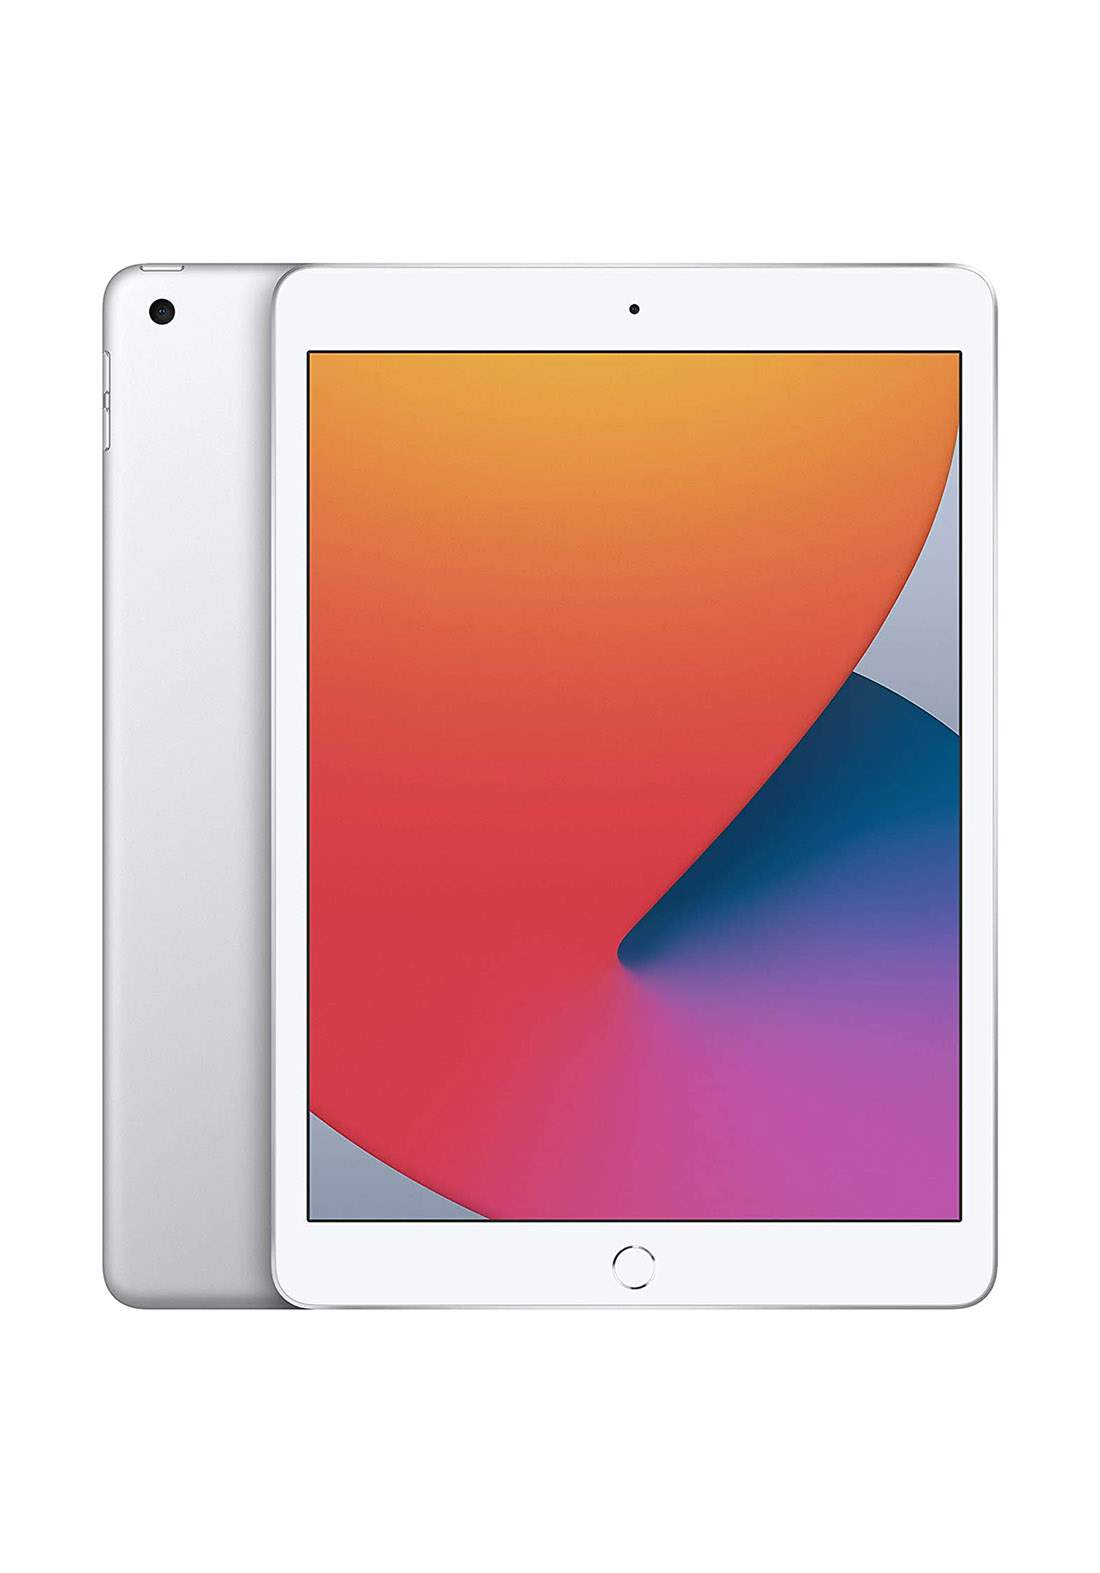 Apple iPad 8th Generation WiFi 3GB RAM 32GB - Silver